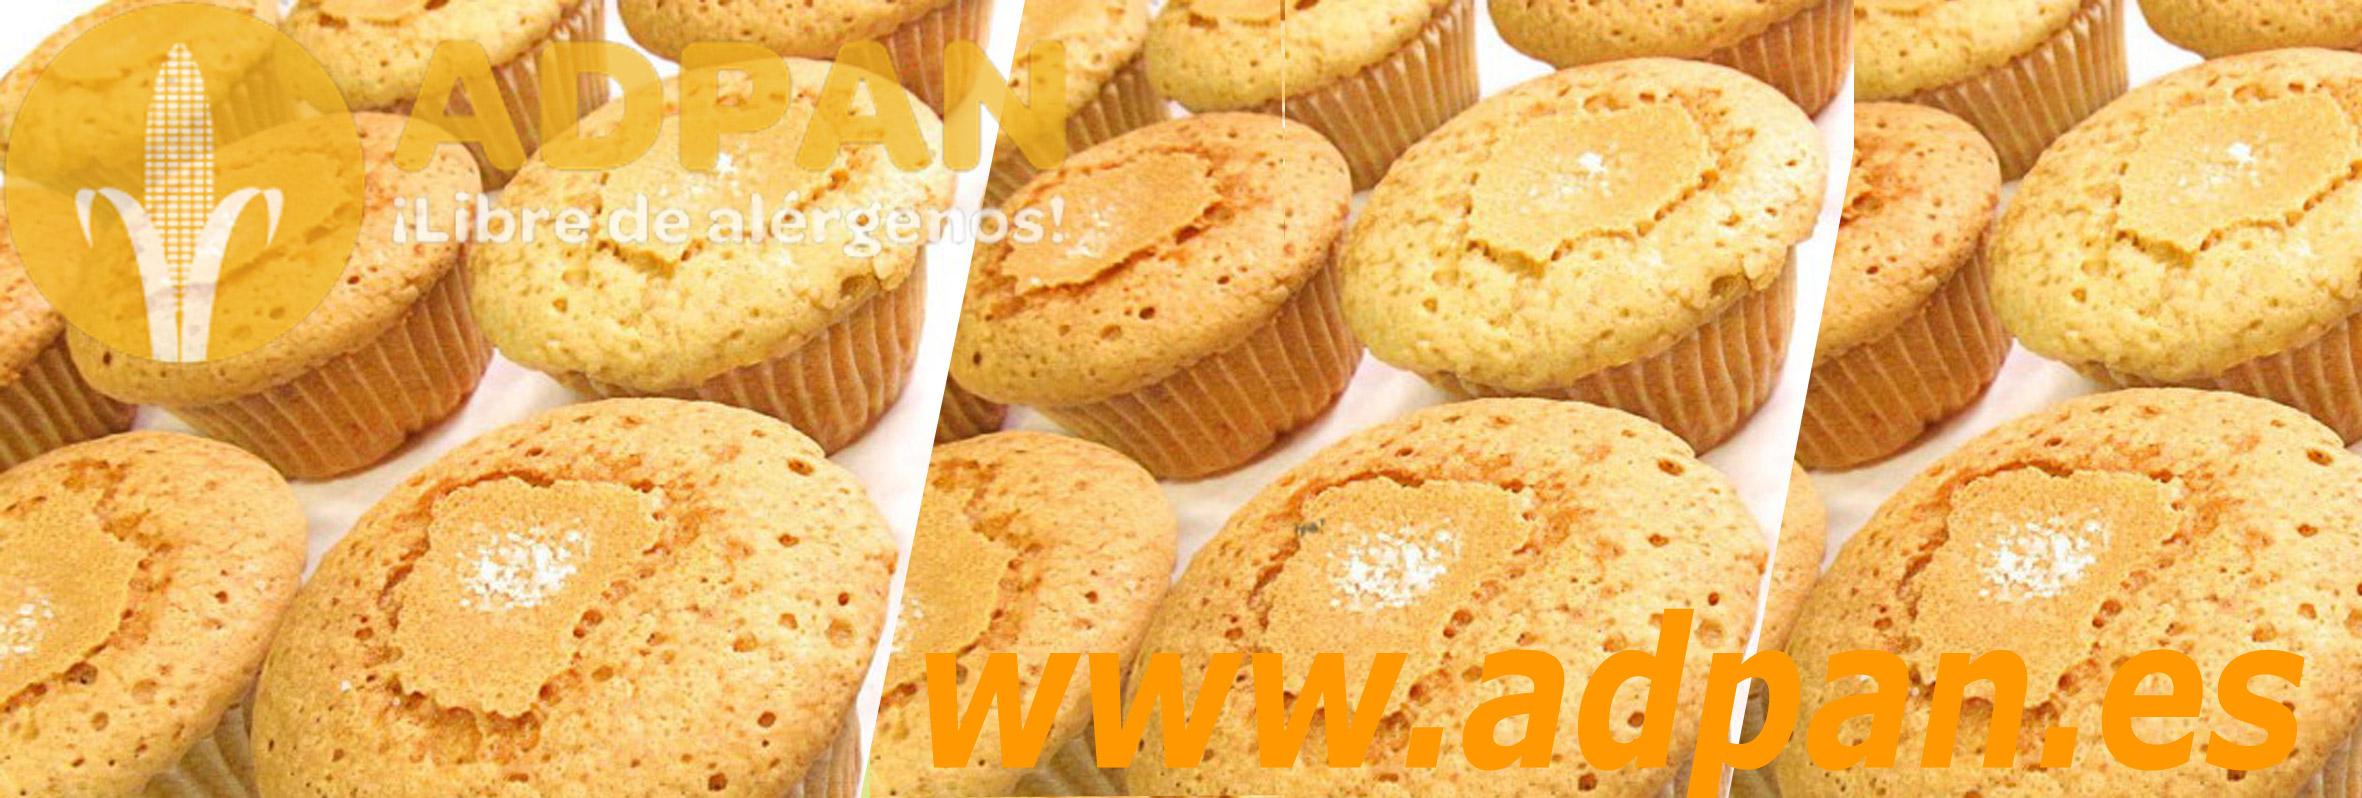 Adpan, prudoctos sin gluten, cocidos con hornos para panaderia STATIC